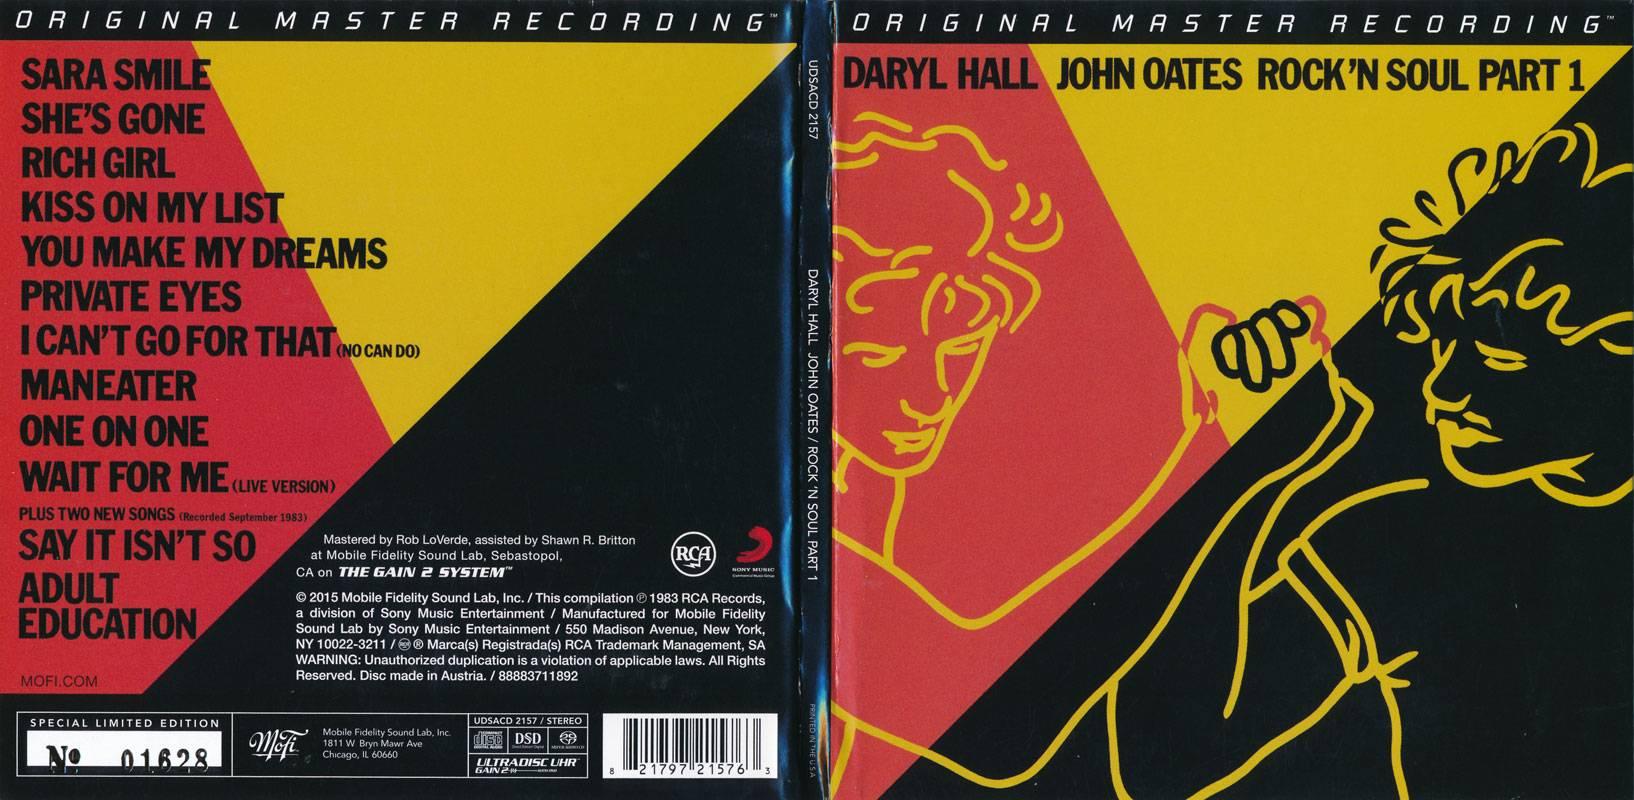 Daryl Hall & John Oates - Rock 'N Soul Part 1 (1983) [MFSL UDSACD 2157]